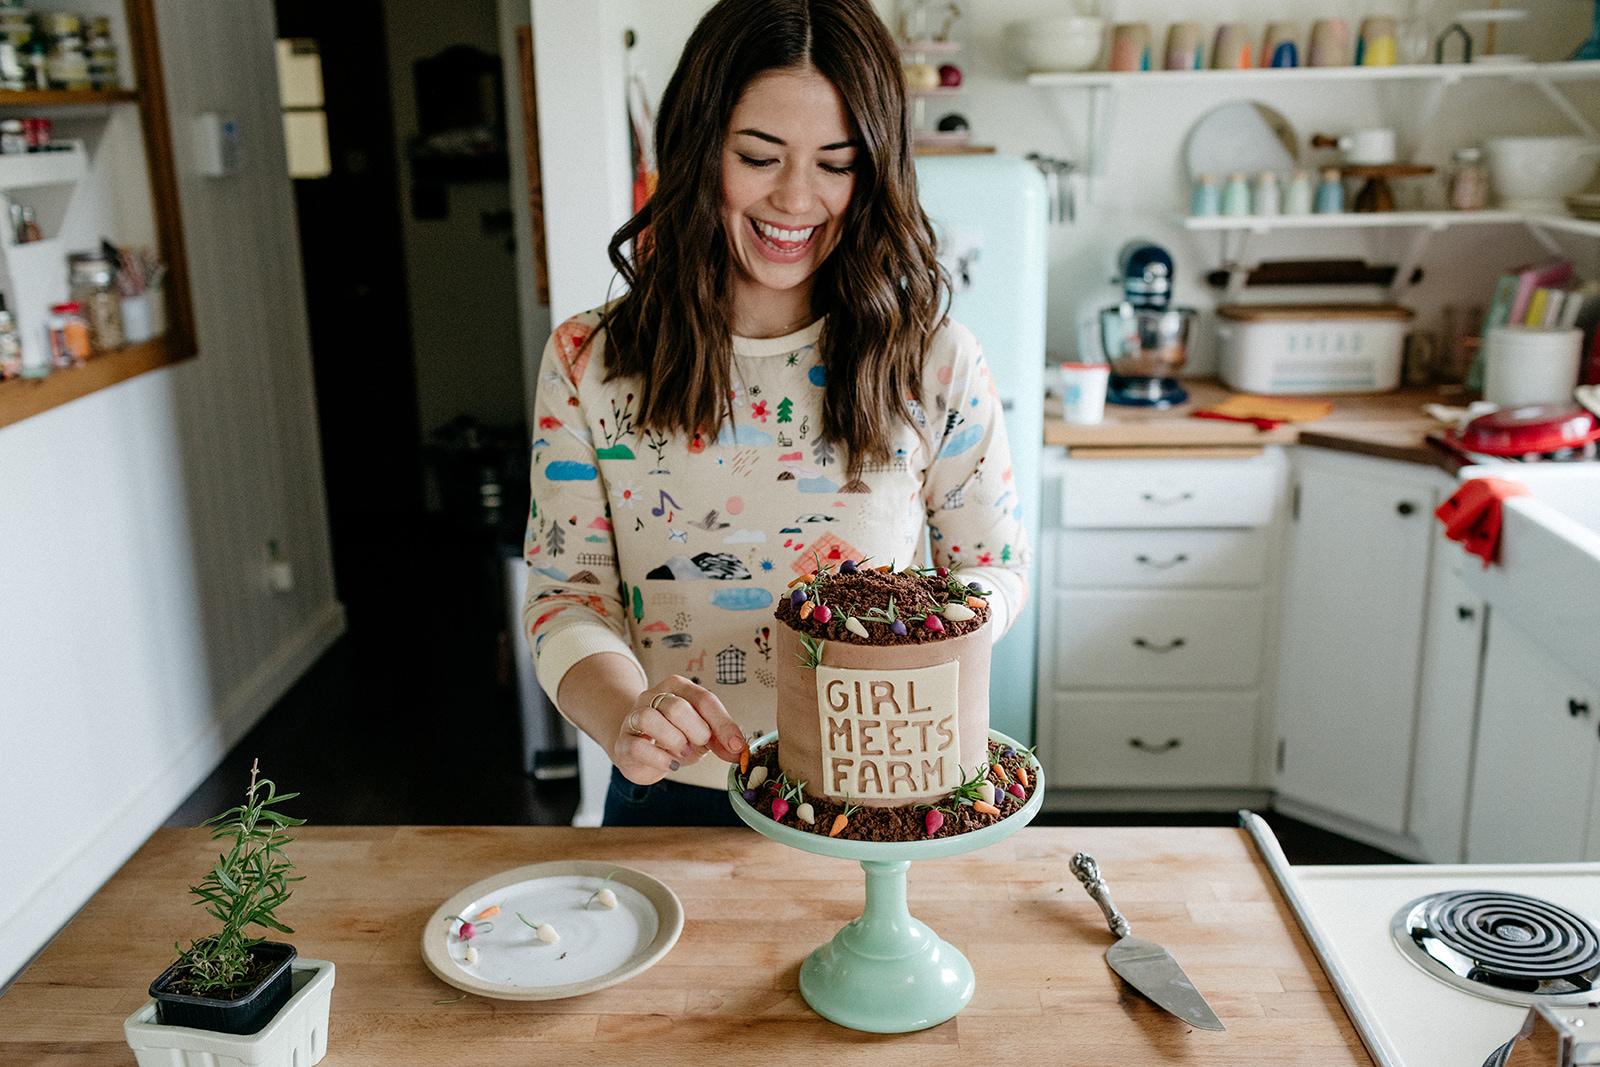 molly-yeh-girl-meets-farm-cake-5.jpg